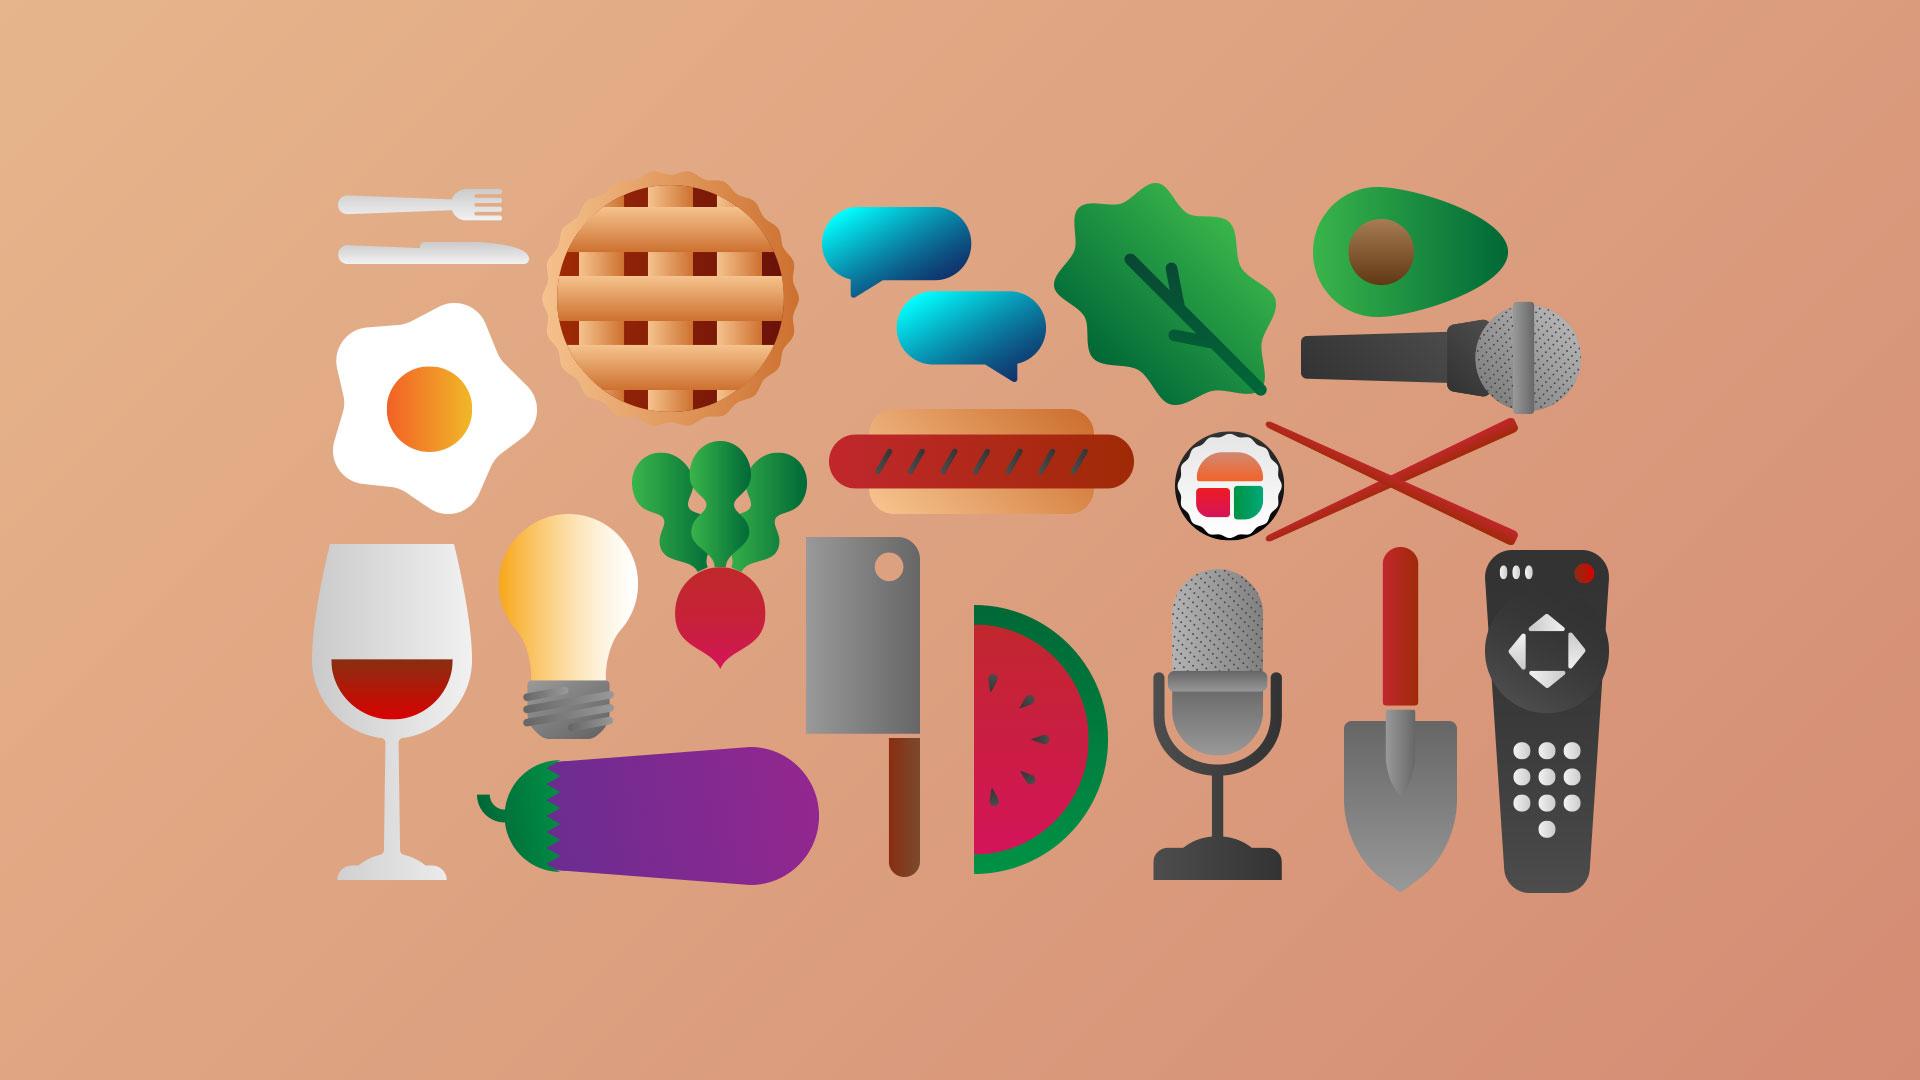 gradient-symbols.jpg